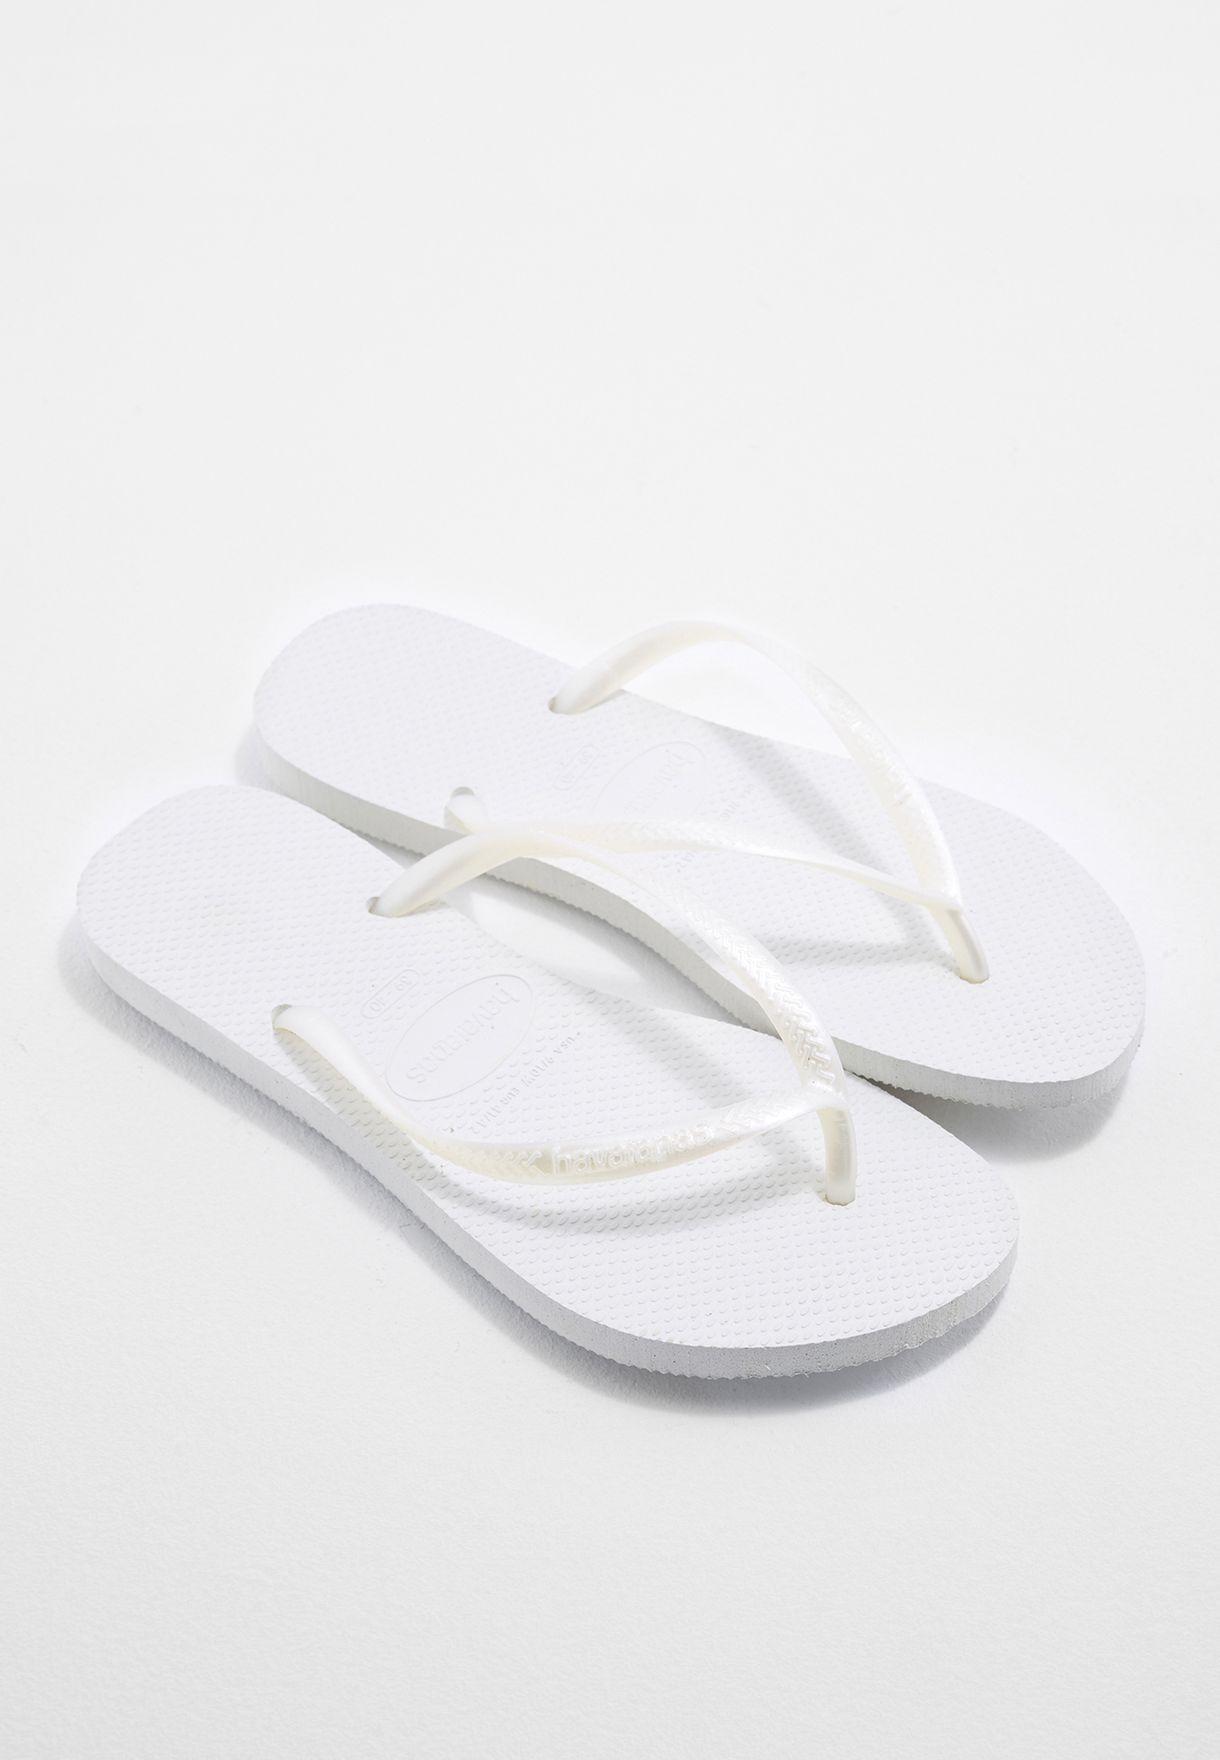 823b545220babc Shop Havaianas white Hav Slim Flip Flops 4000030 for Women in UAE ...